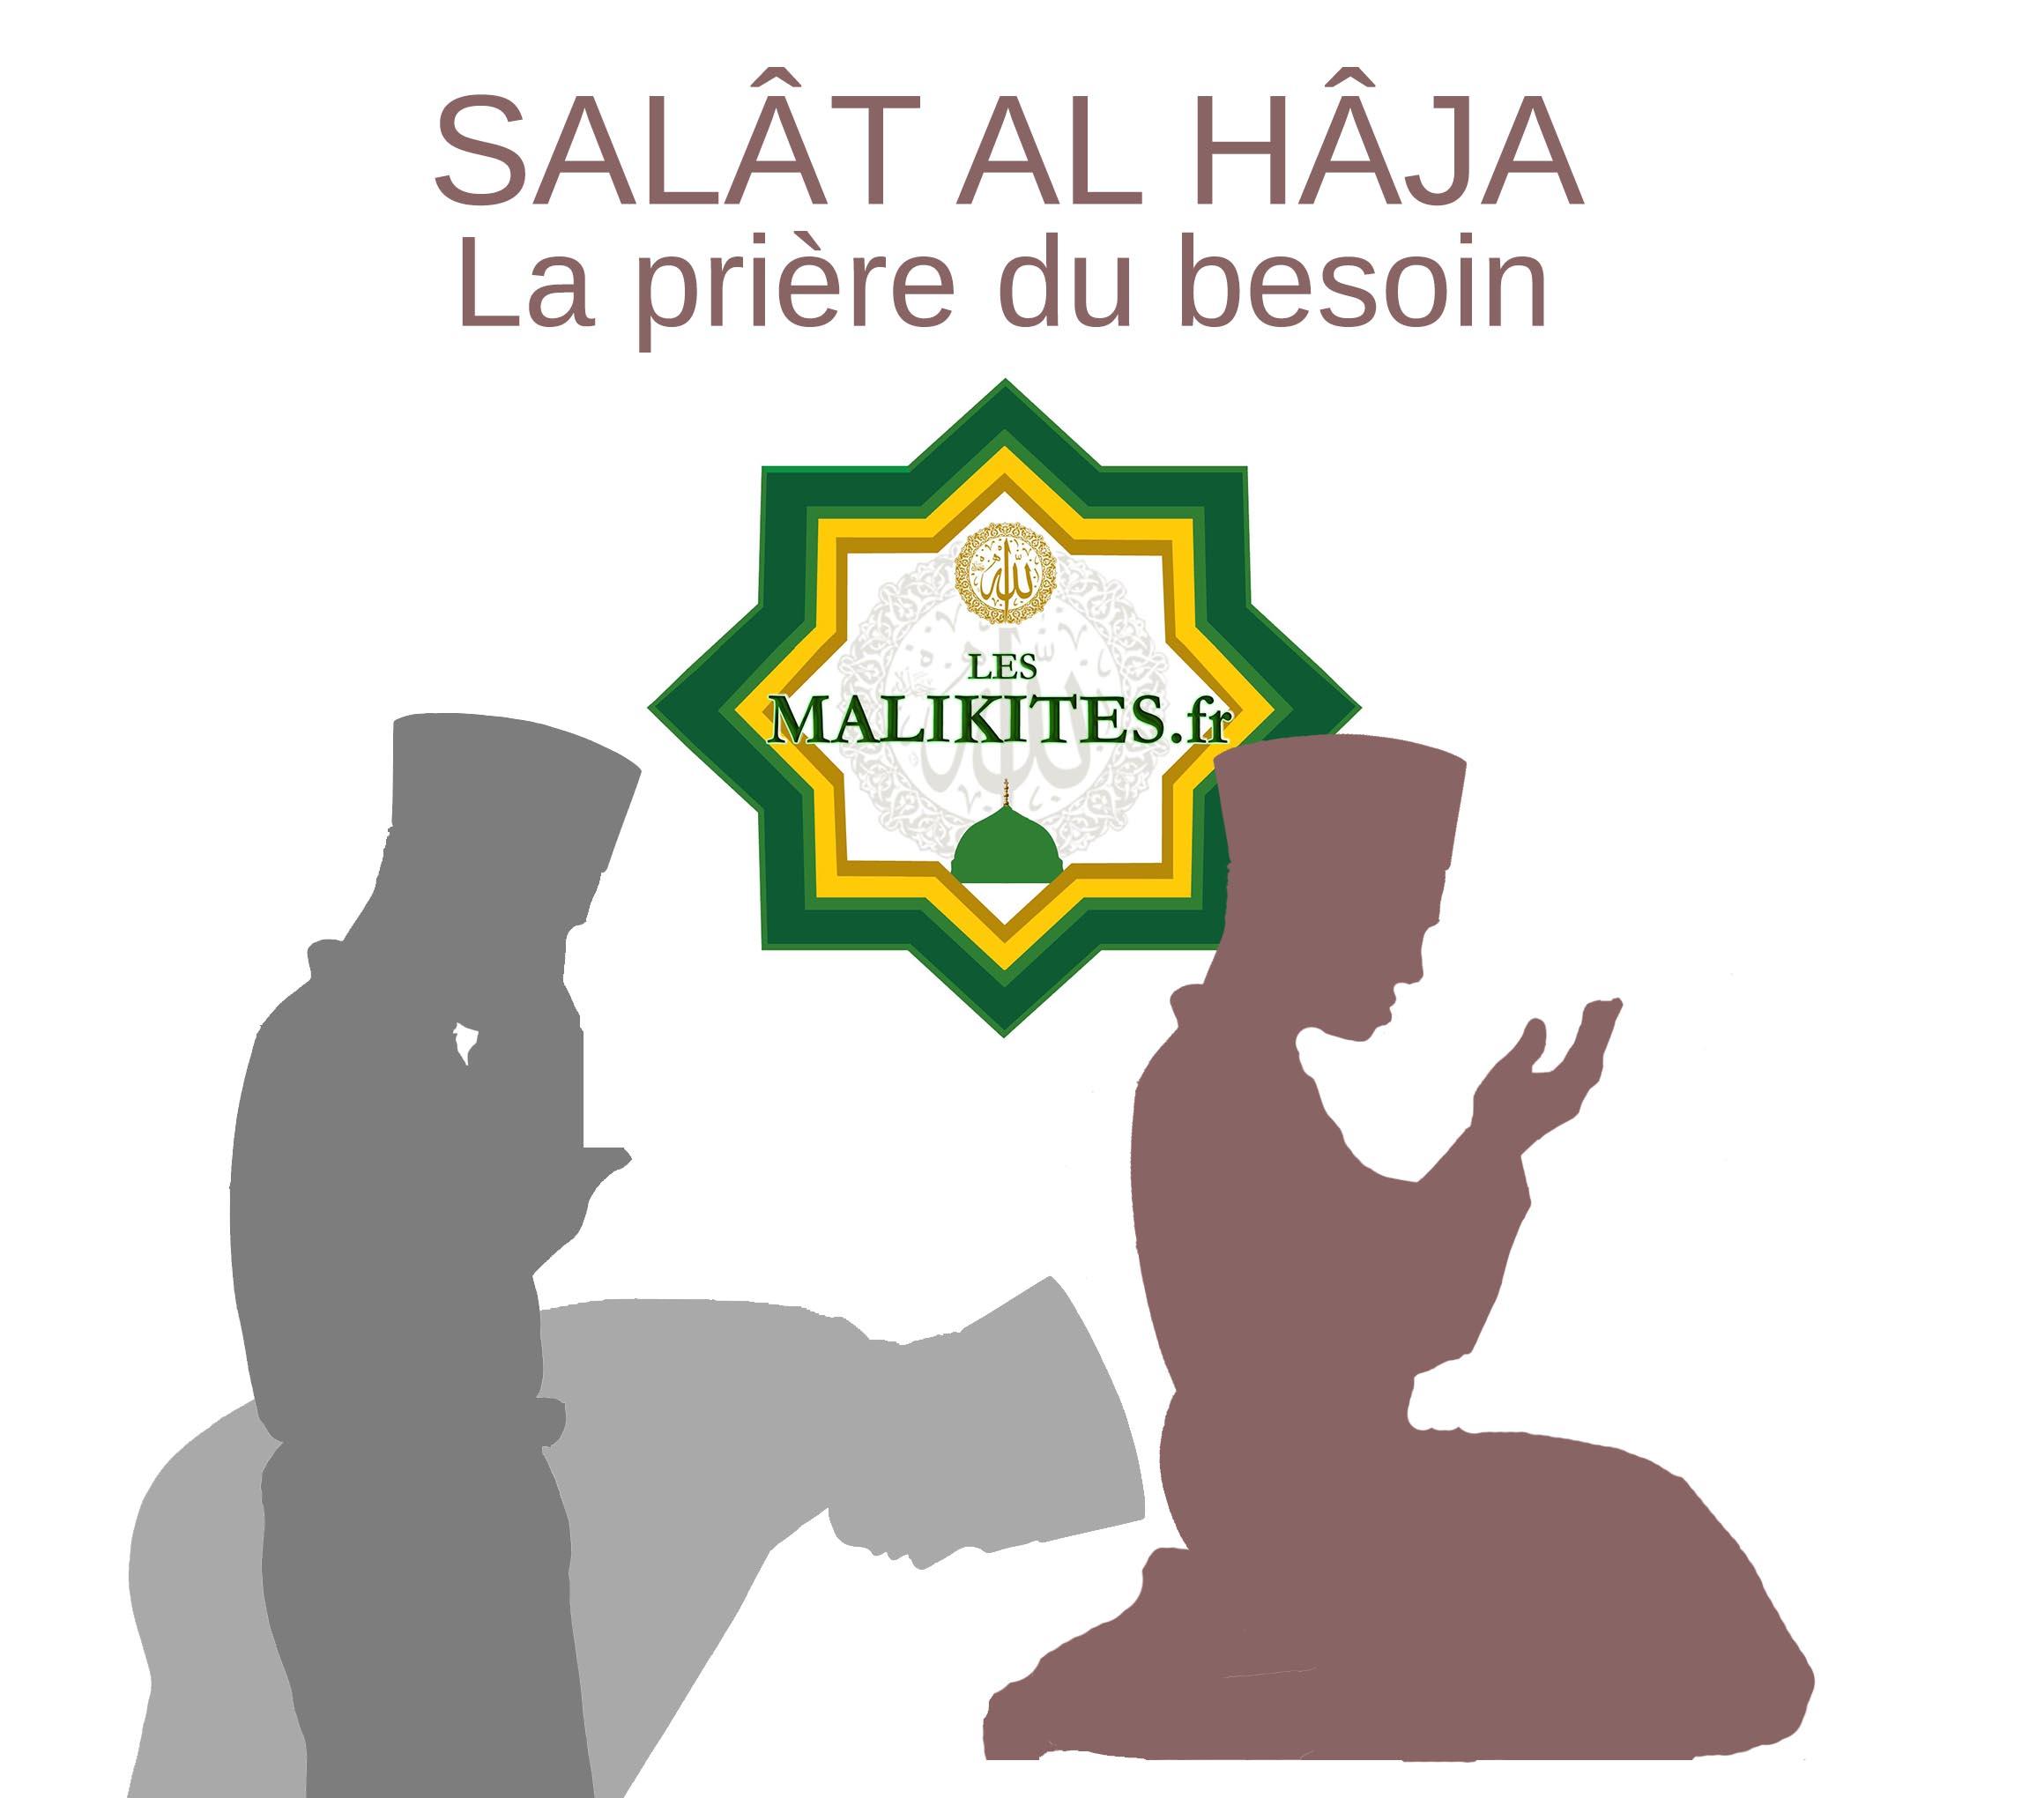 priere-etape.-Salat-el-haja.-Les-malikites